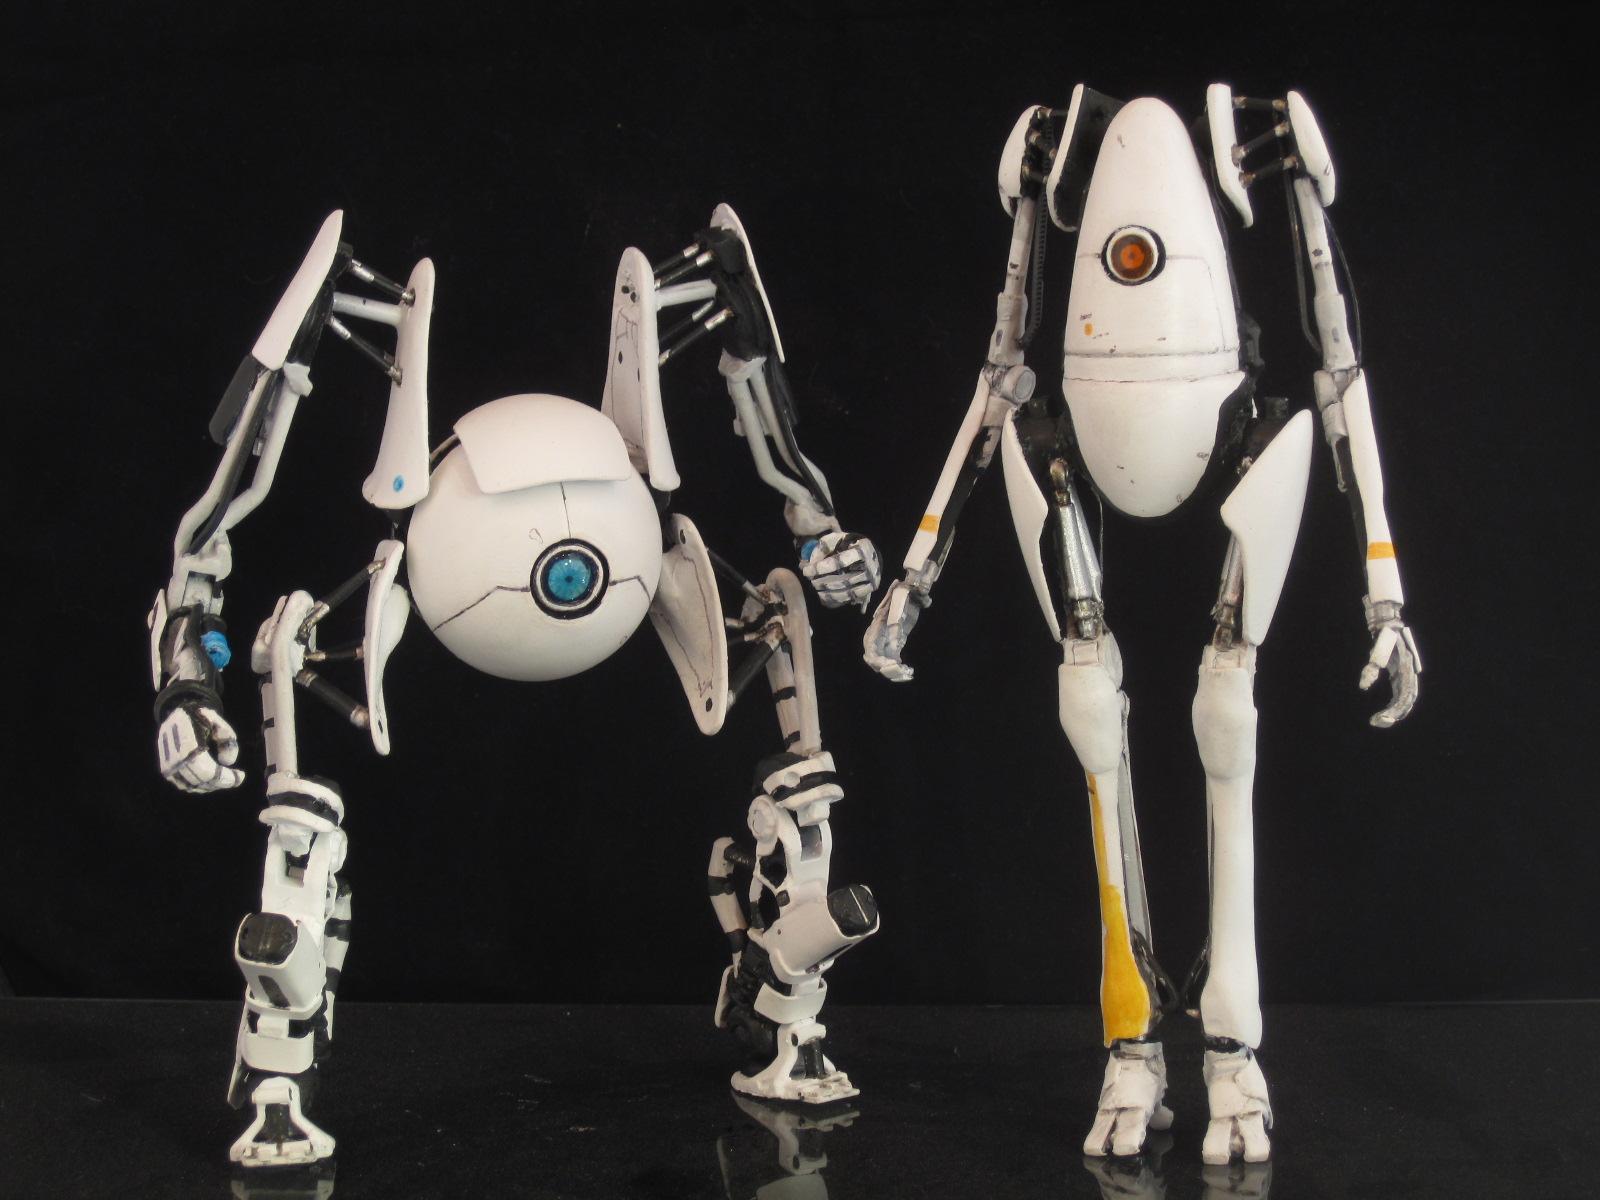 Portal 2 Robots P Body And Atlas Custom Action Figure Toys